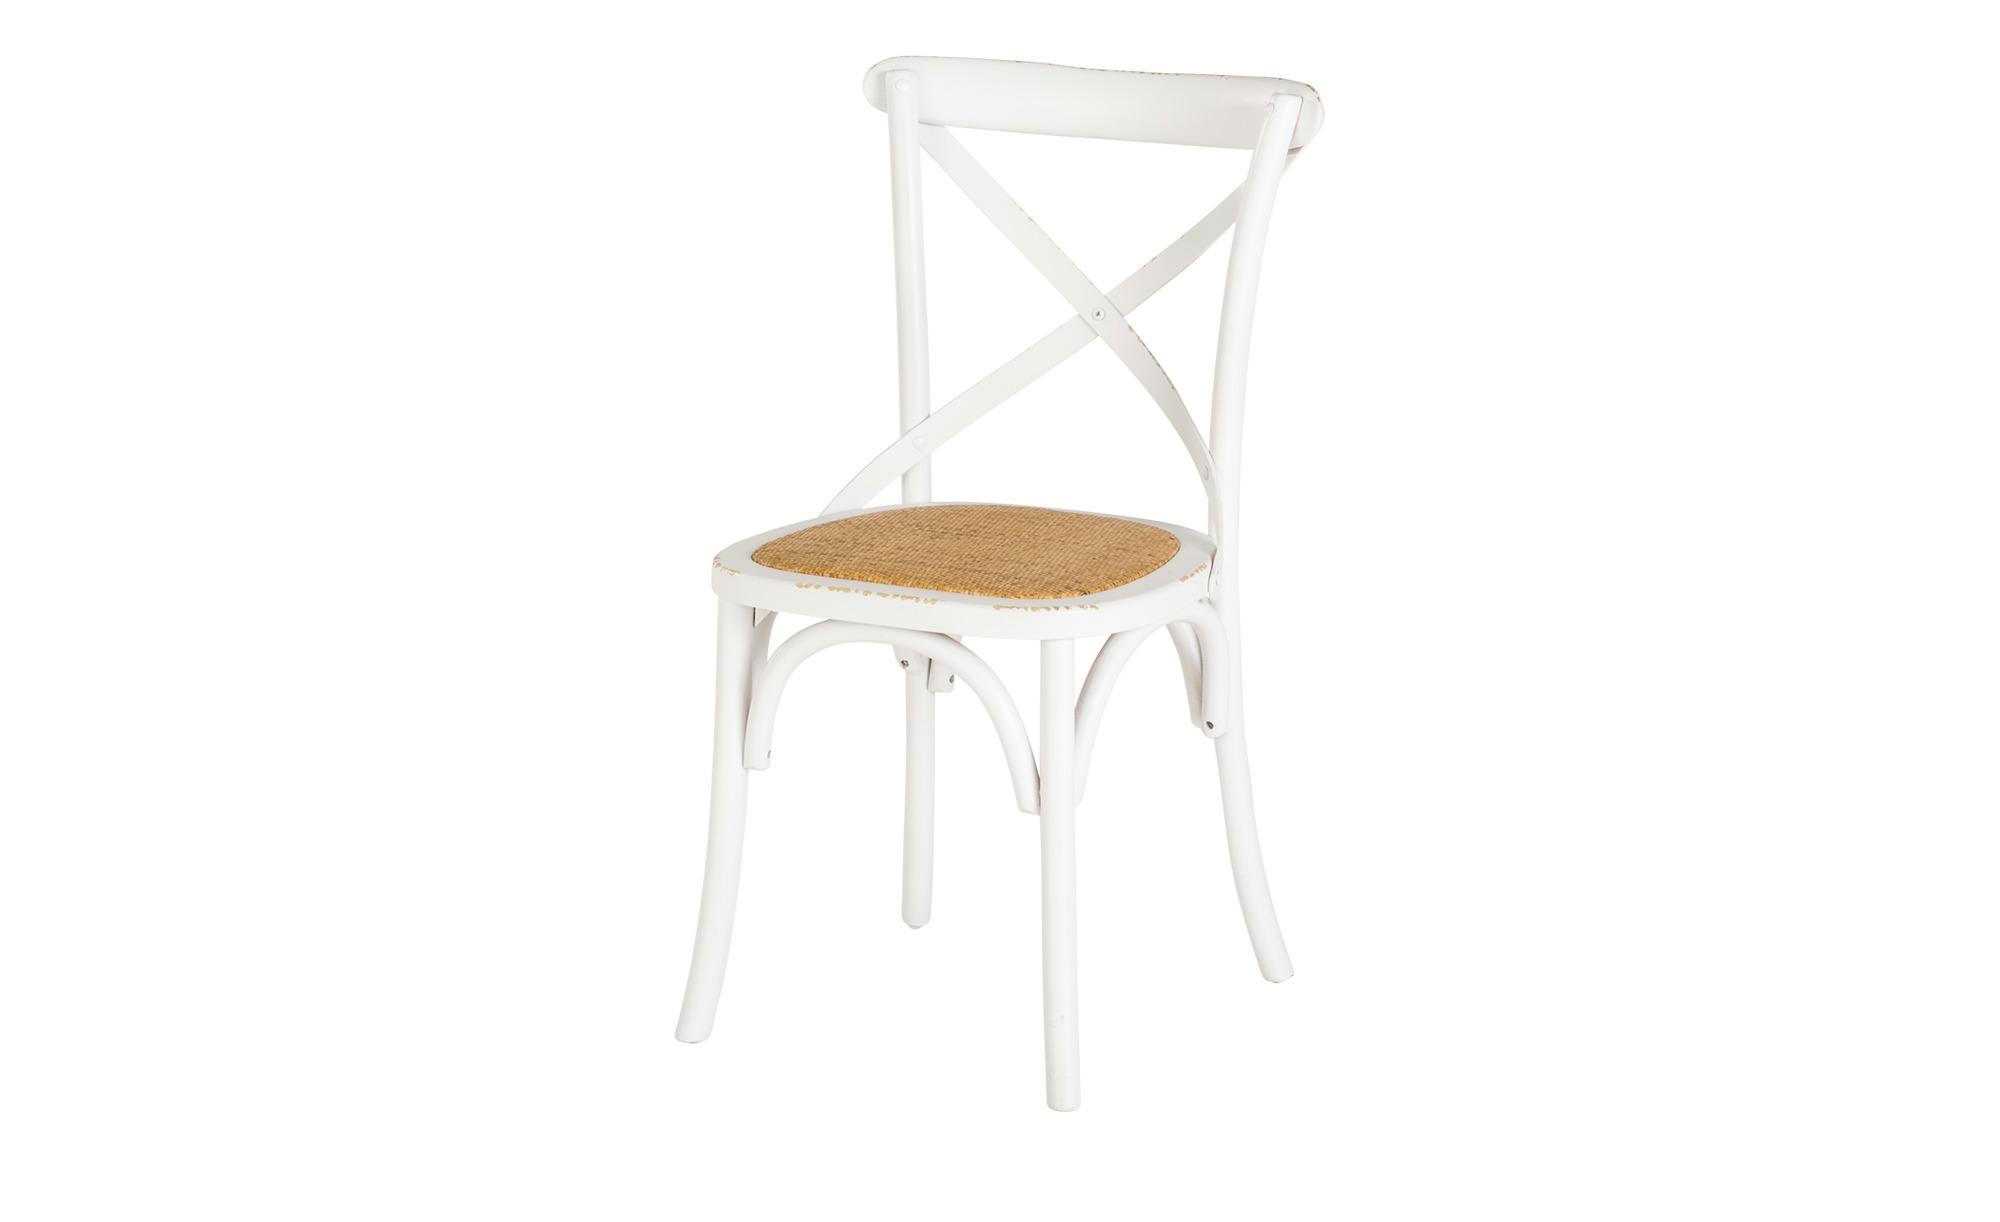 Holz-Stuhl im Used-Look, gefunden bei Möbel Kraft